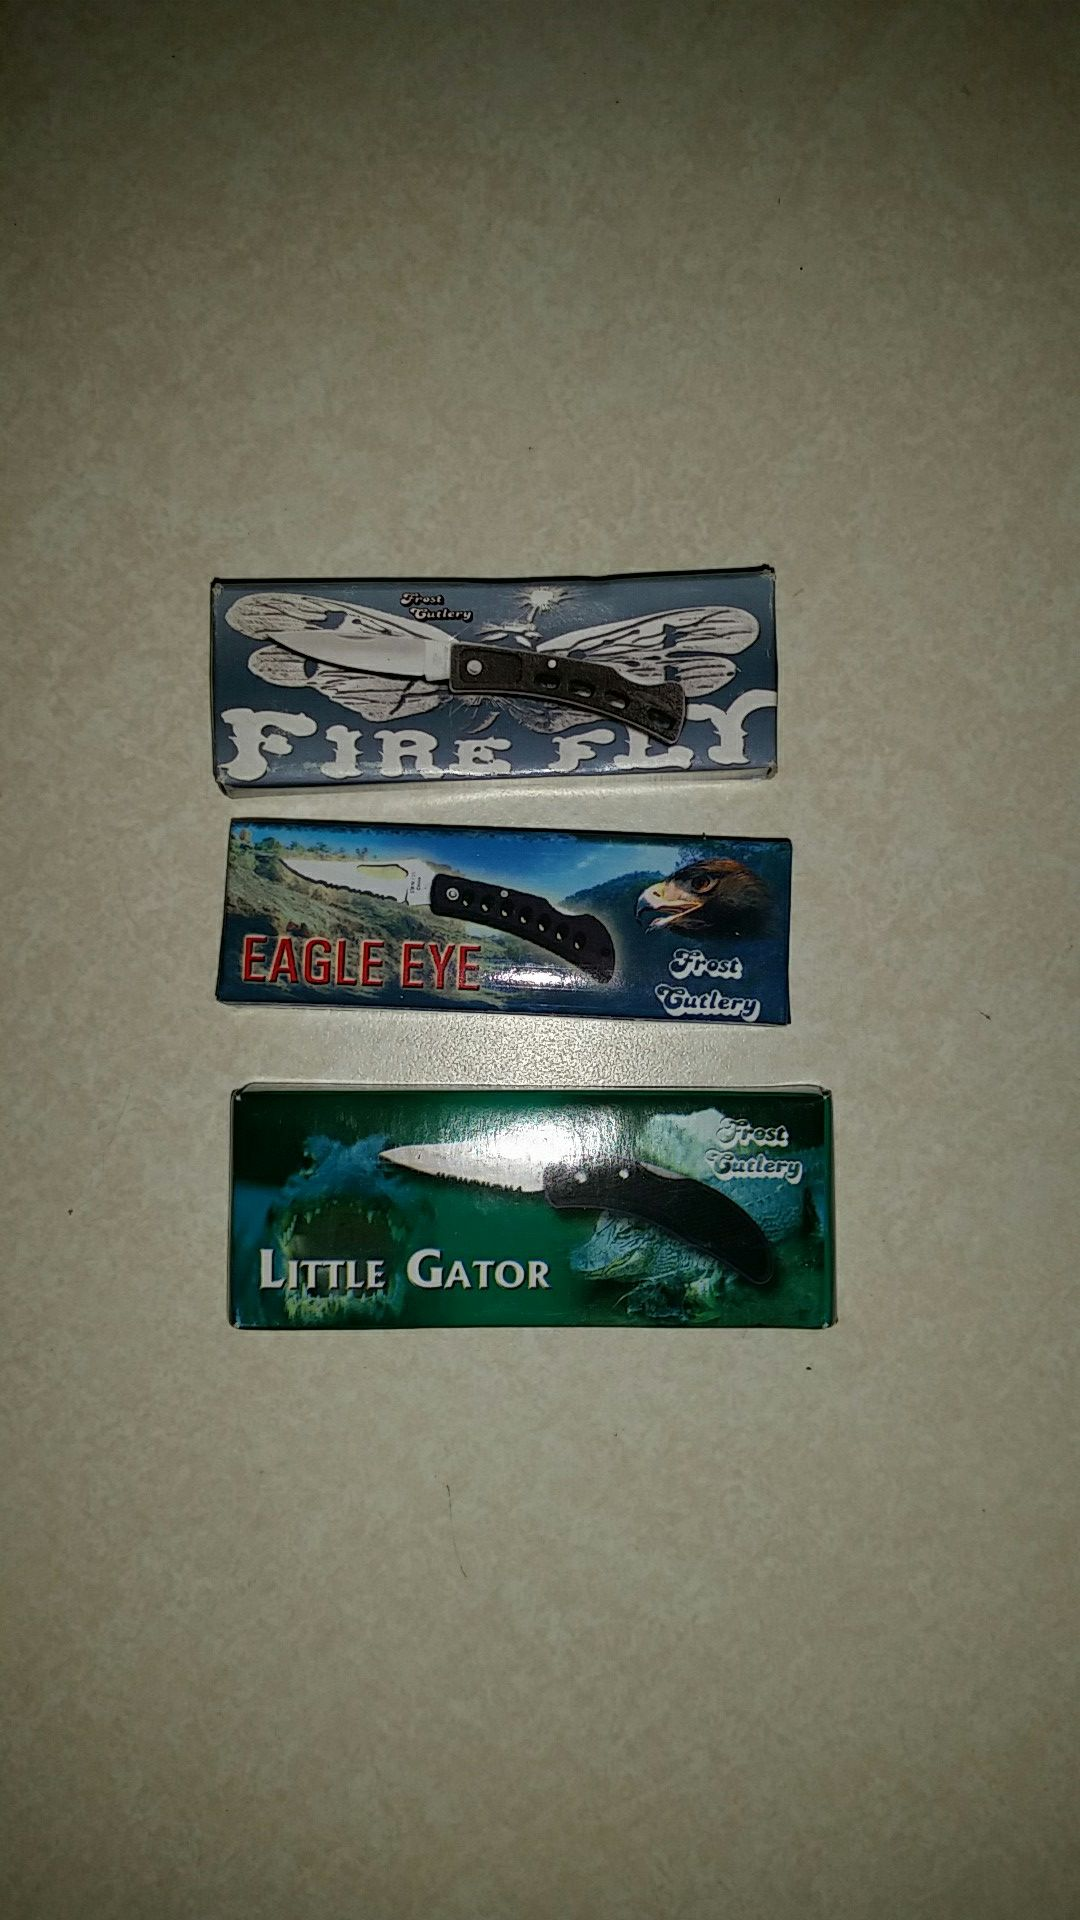 Firefly, eagle eye, little gator